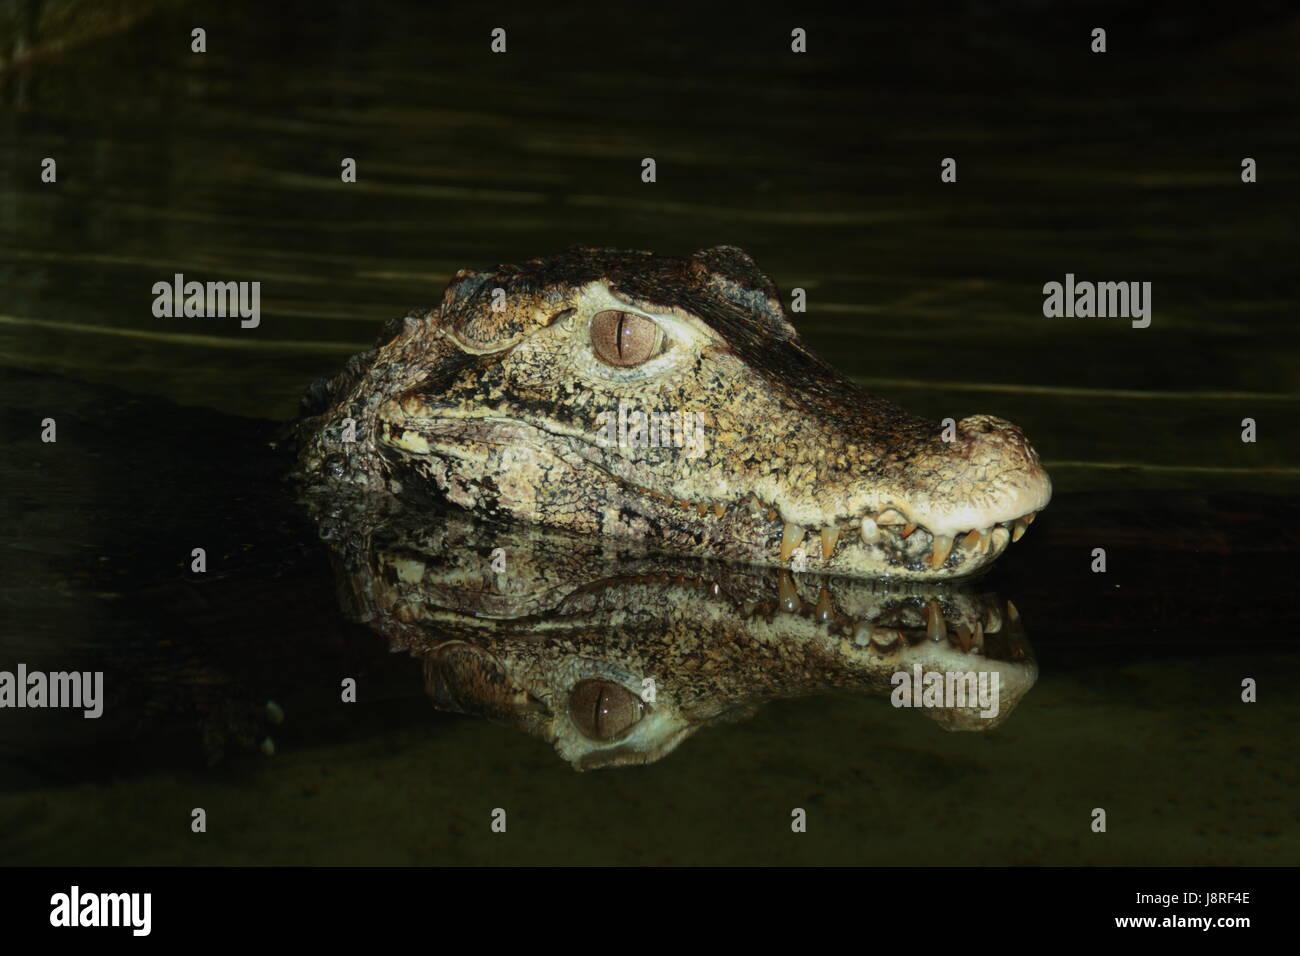 reptile, crocodile, dangerous, water, swimming, swiming, swim, swims, to do the - Stock Image